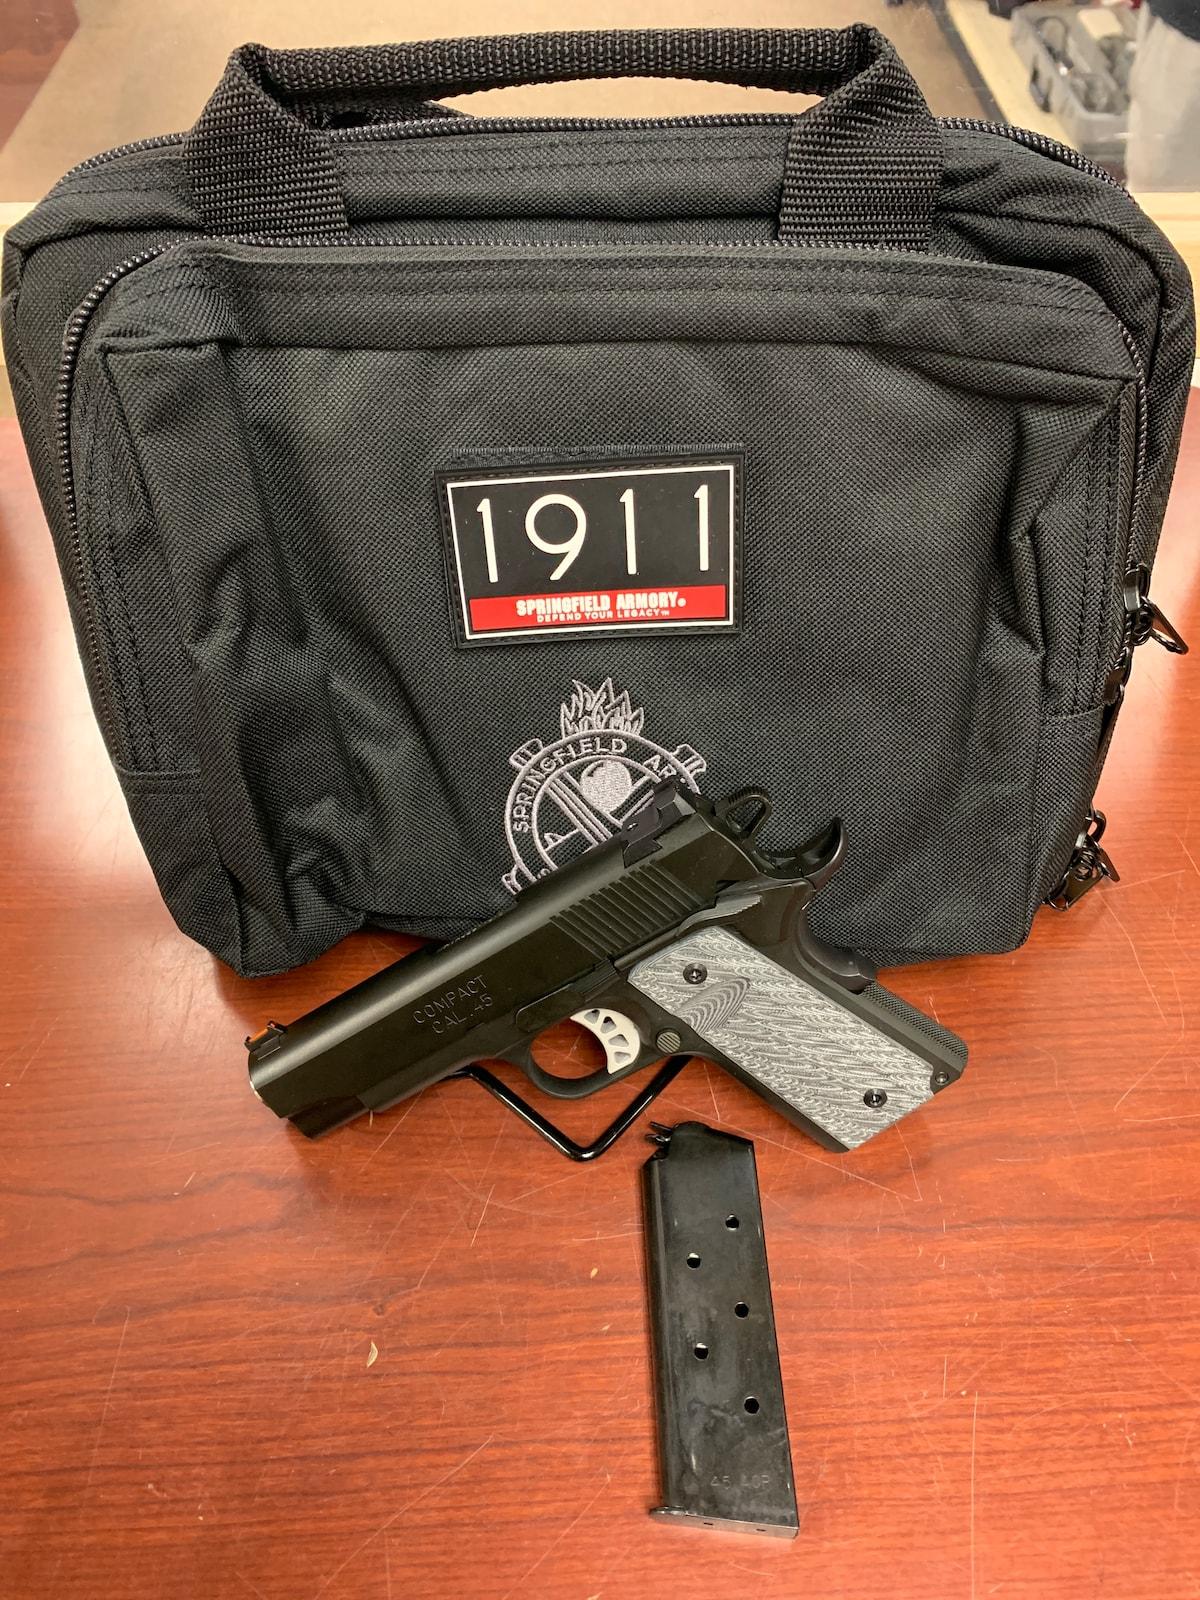 SPRINGFIELD ARMORY 1911 ro elite compact